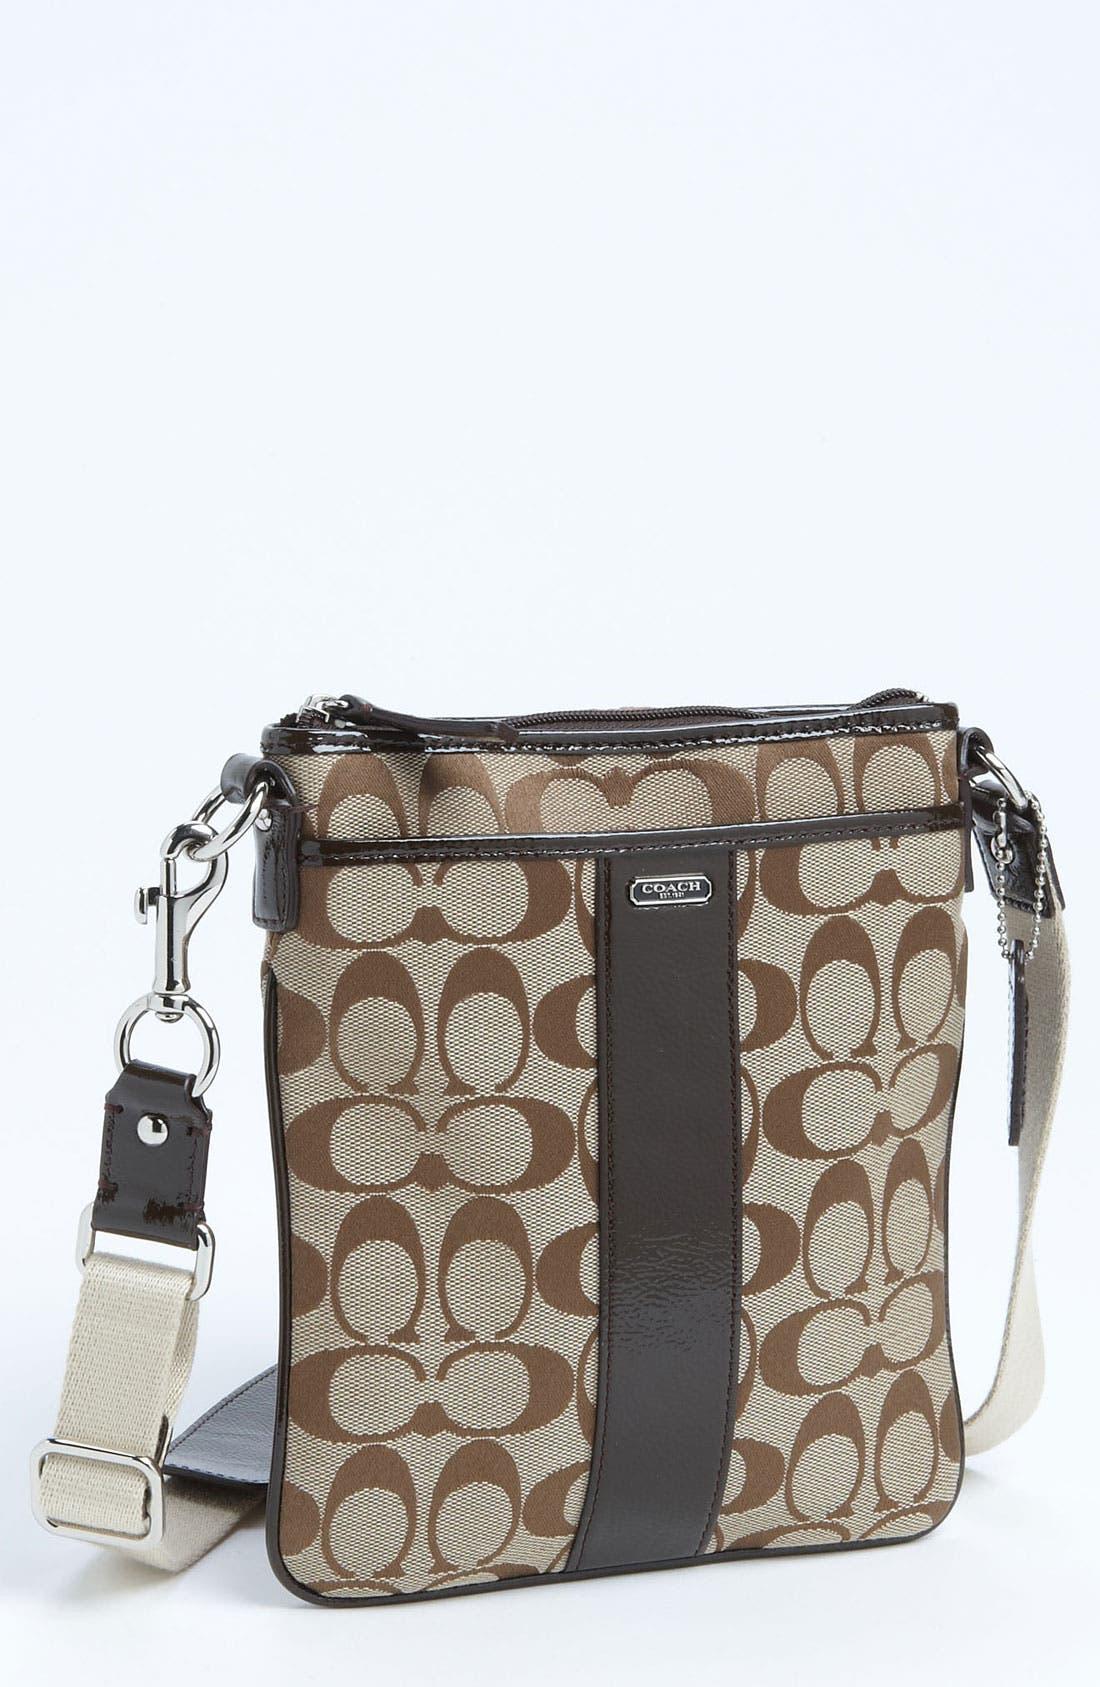 Alternate Image 1 Selected - COACH 'Signature - Swingpack' Crossbody Bag